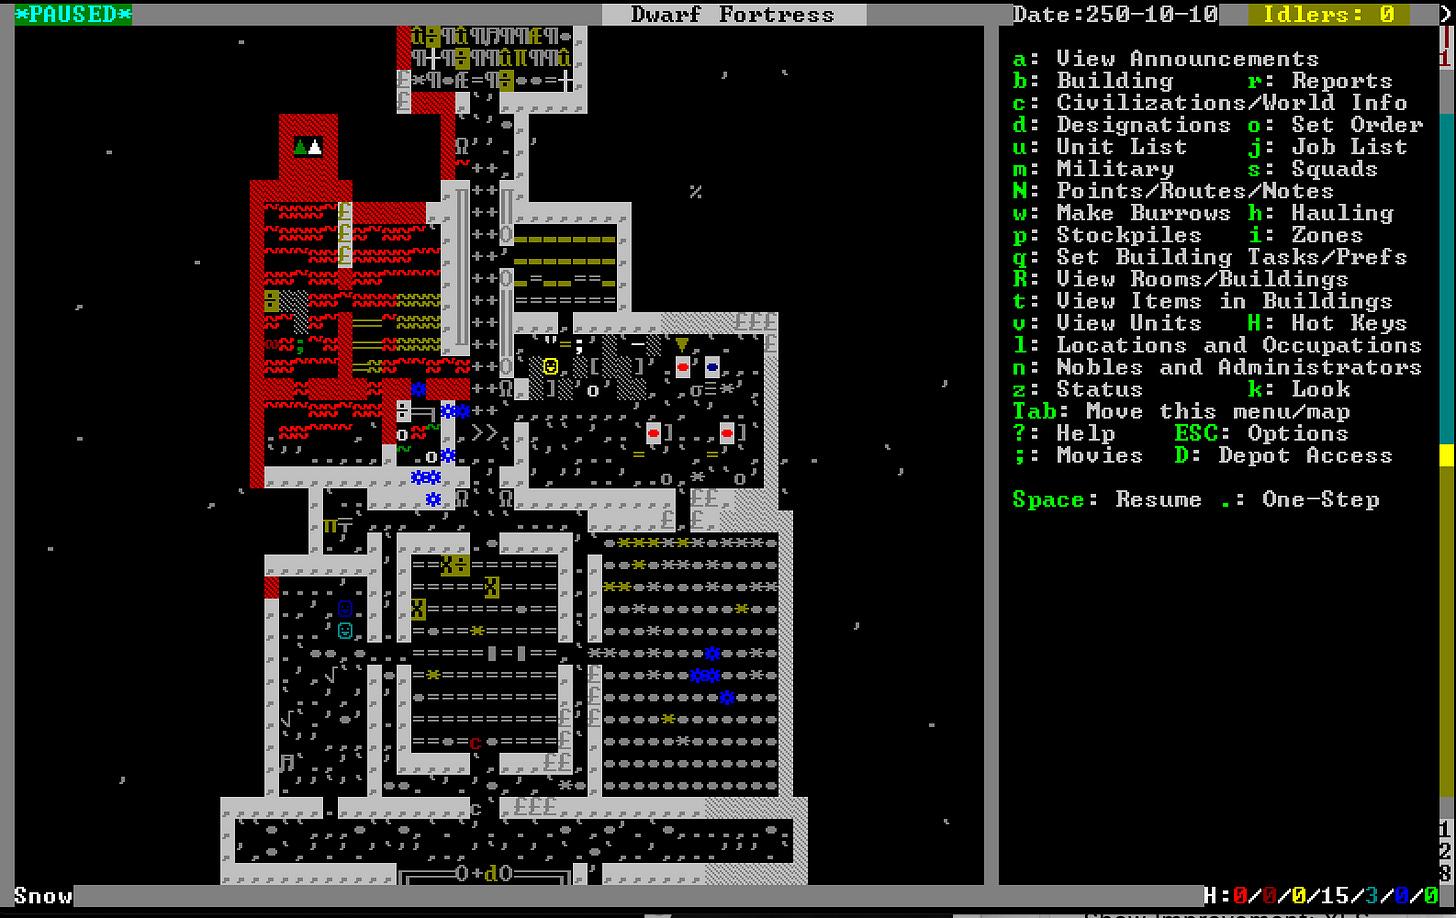 Screenshot of Dwarf Fortress showing an ASCII art fortress map and a complex menu of keyboard-triggered commands.